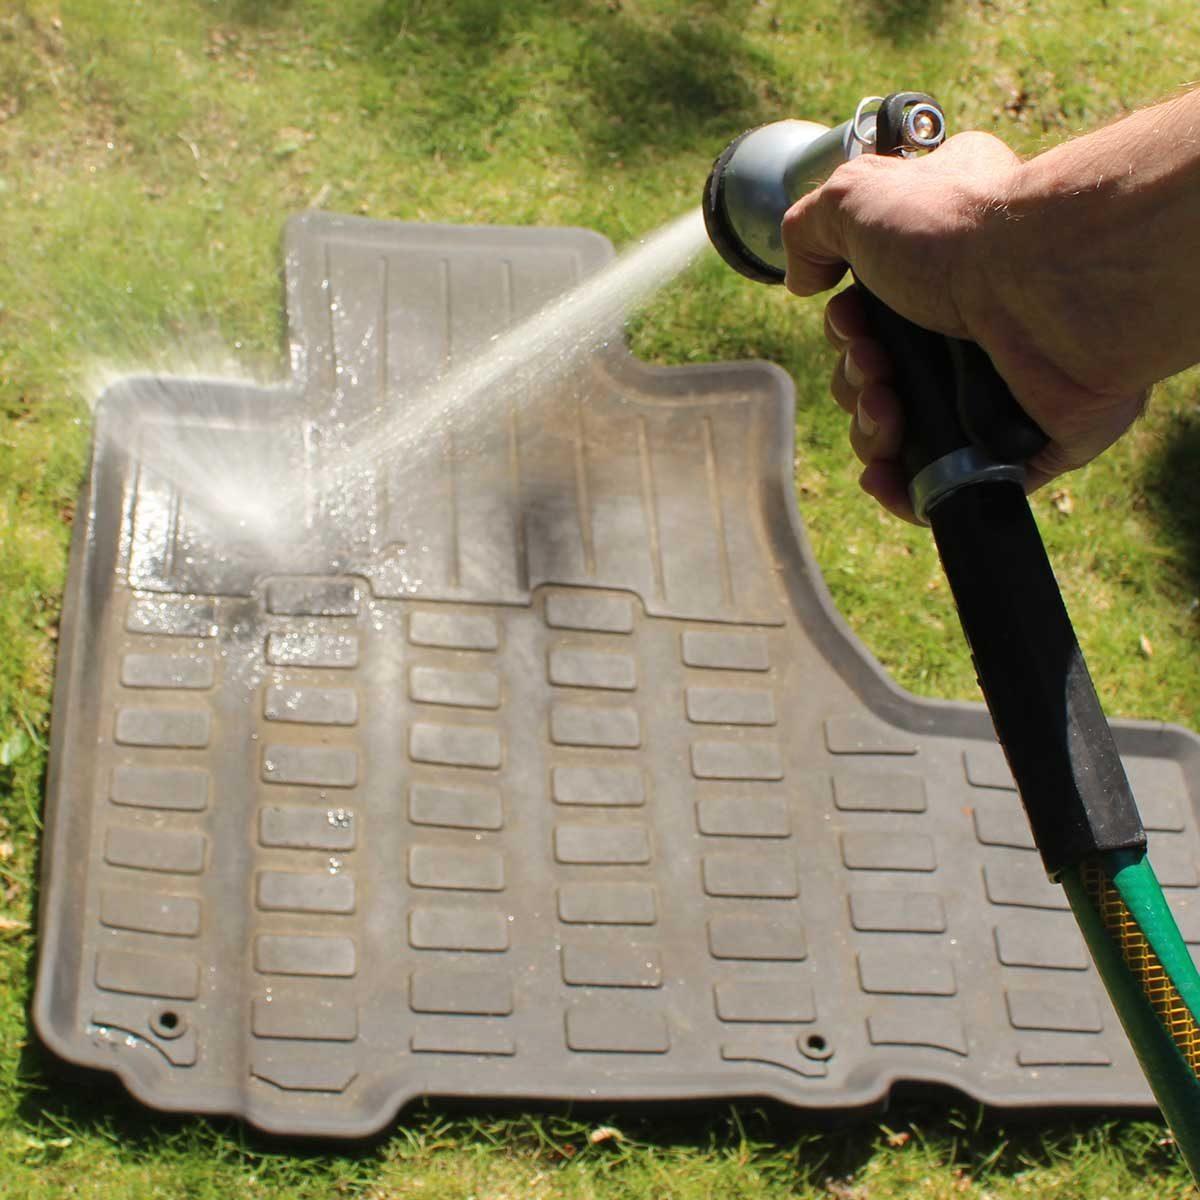 Step 1: spray the rubber car mats